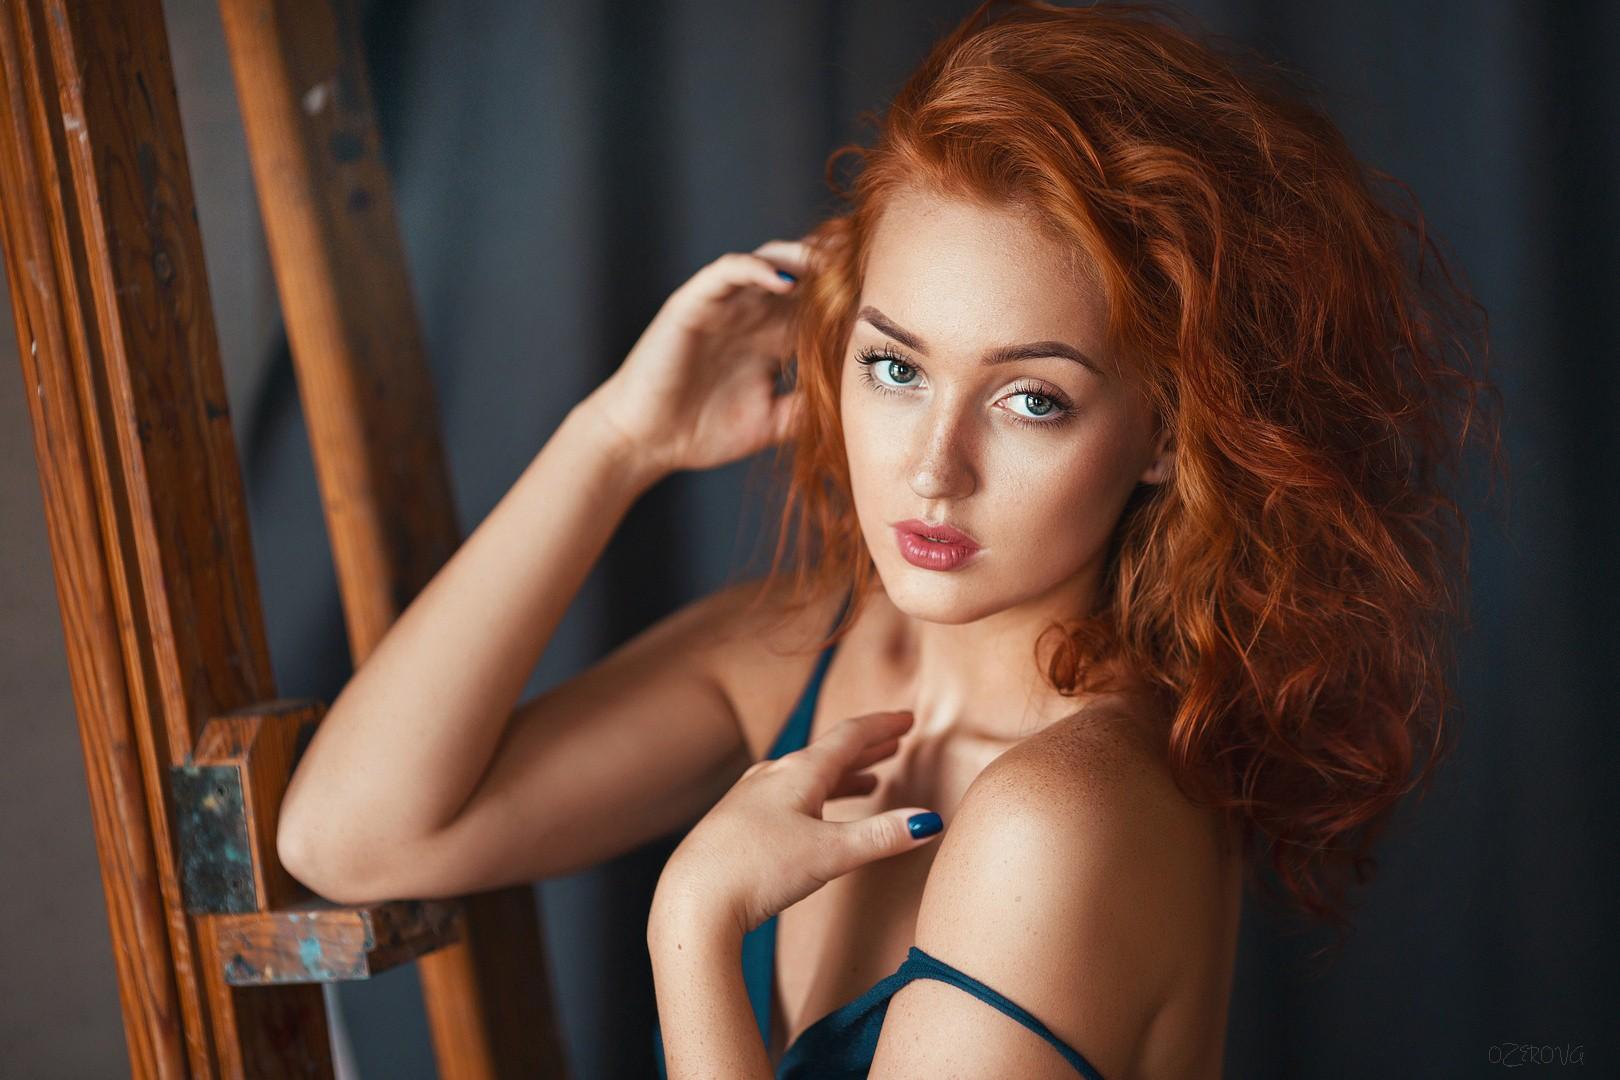 Wallpaper : face, women, redhead, long hair, looking at viewer ...